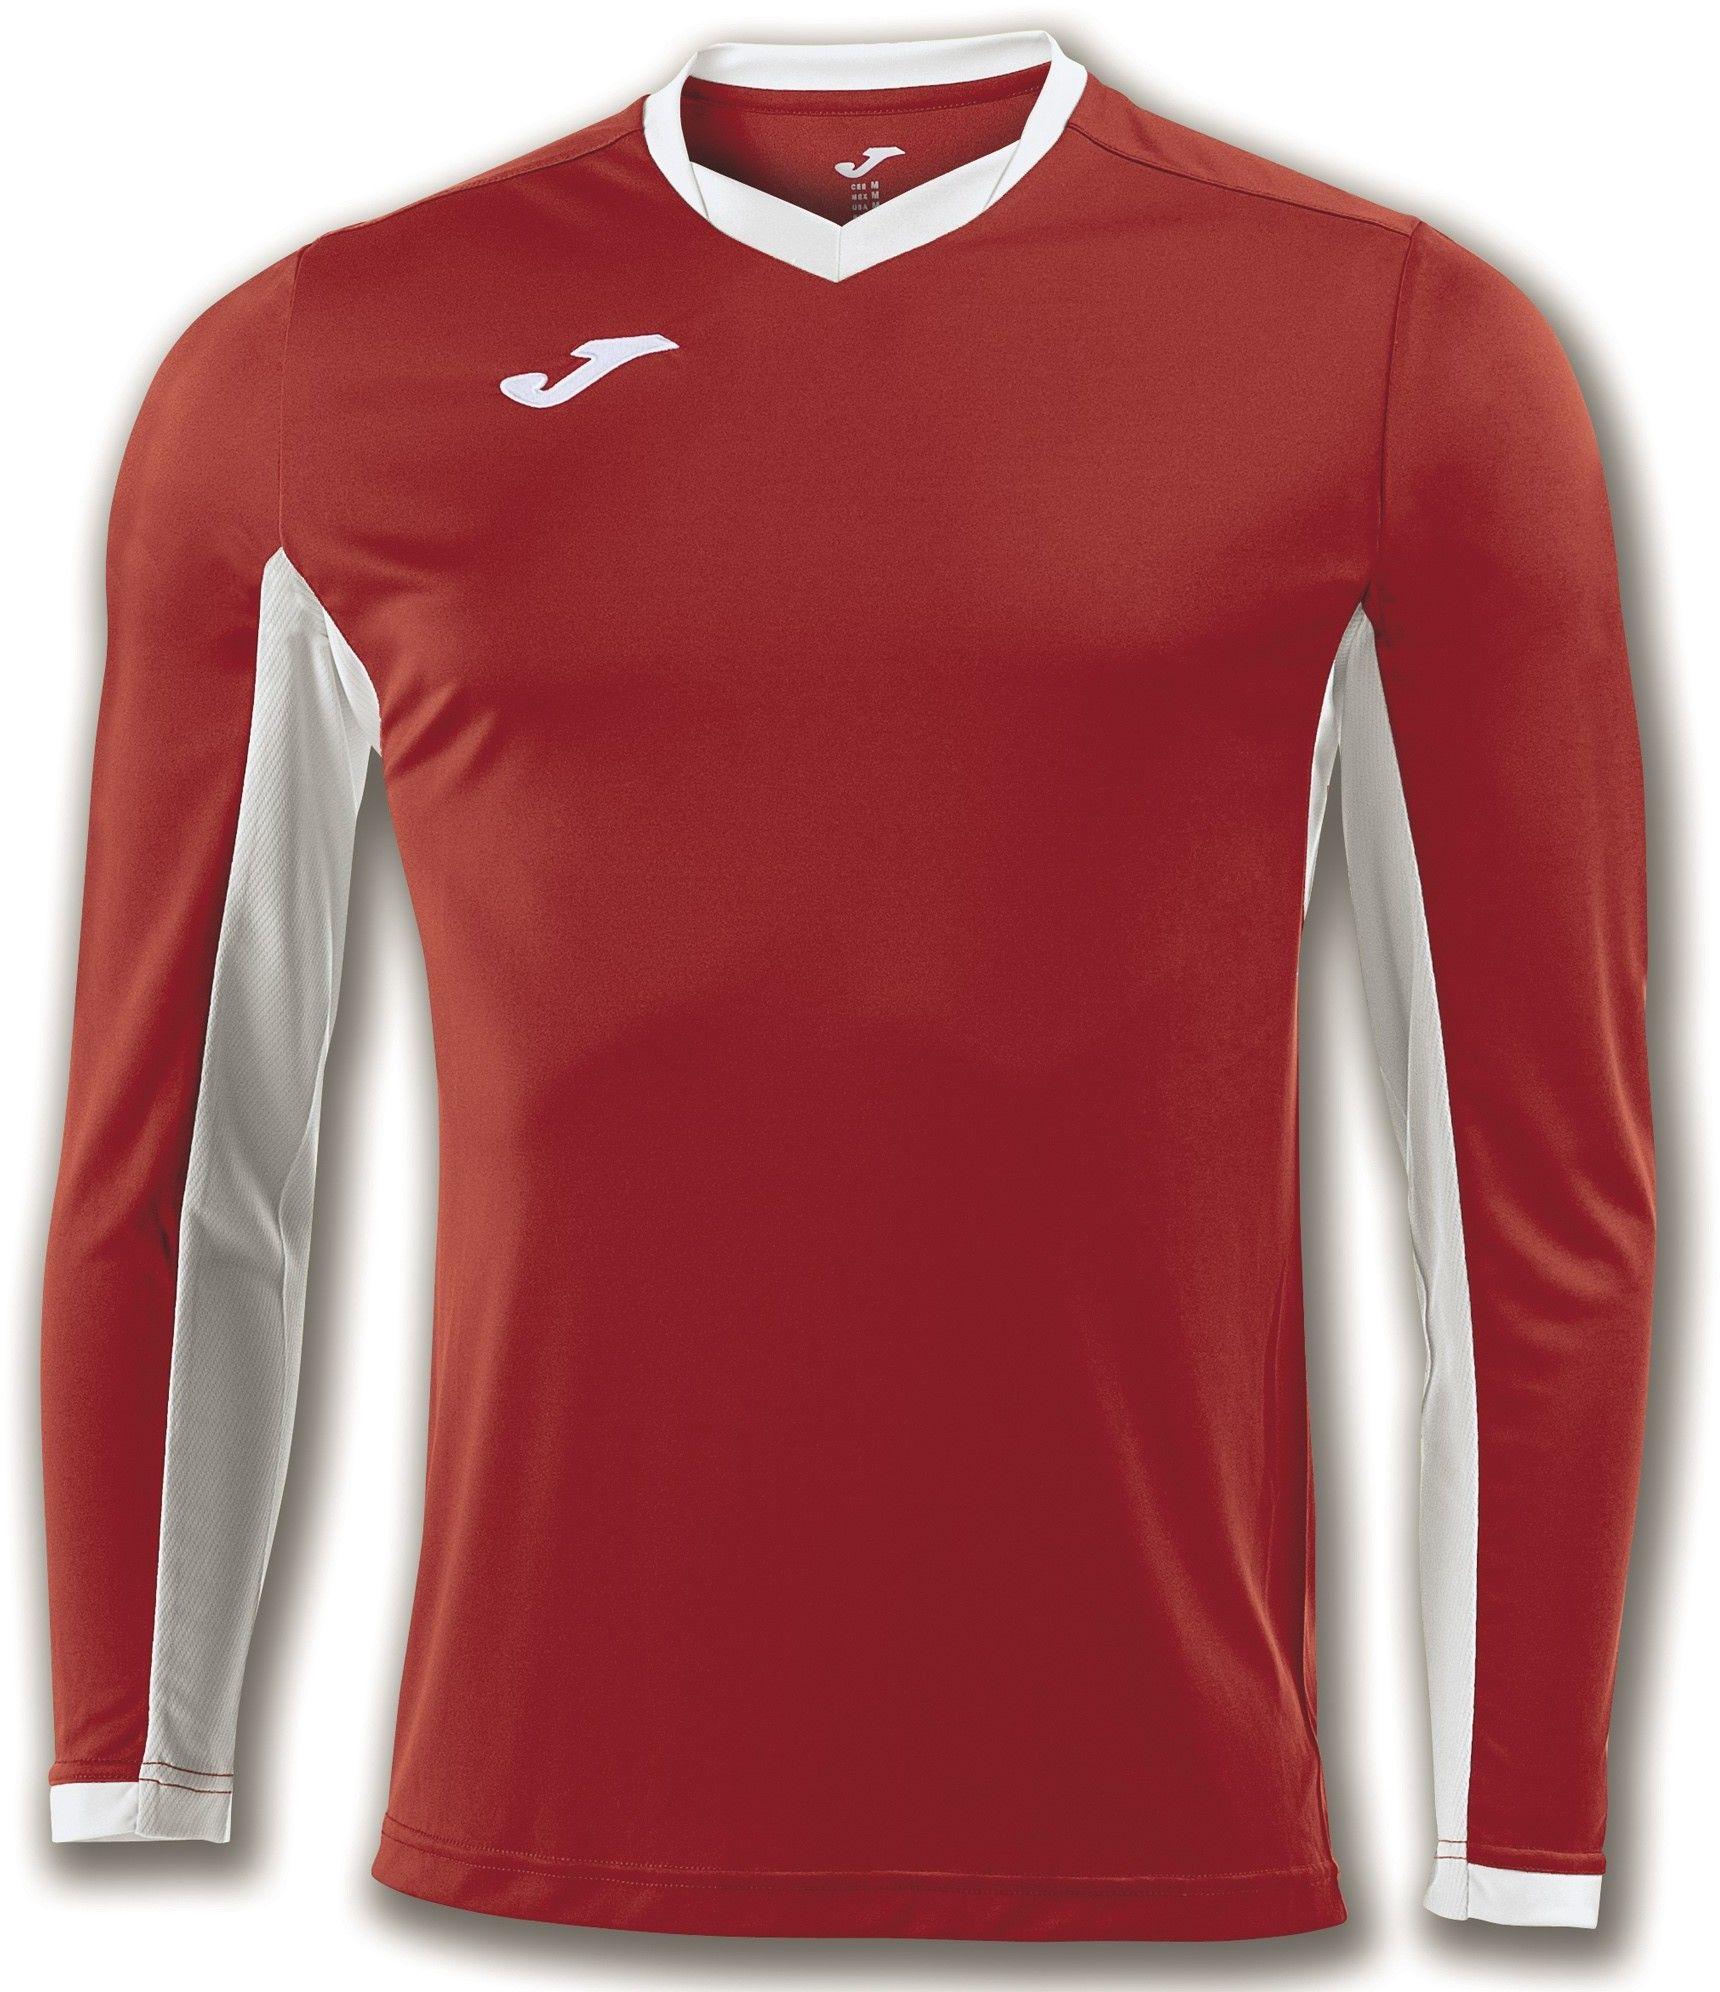 Koszulka Joma Champion IV red/white (10 szt.)